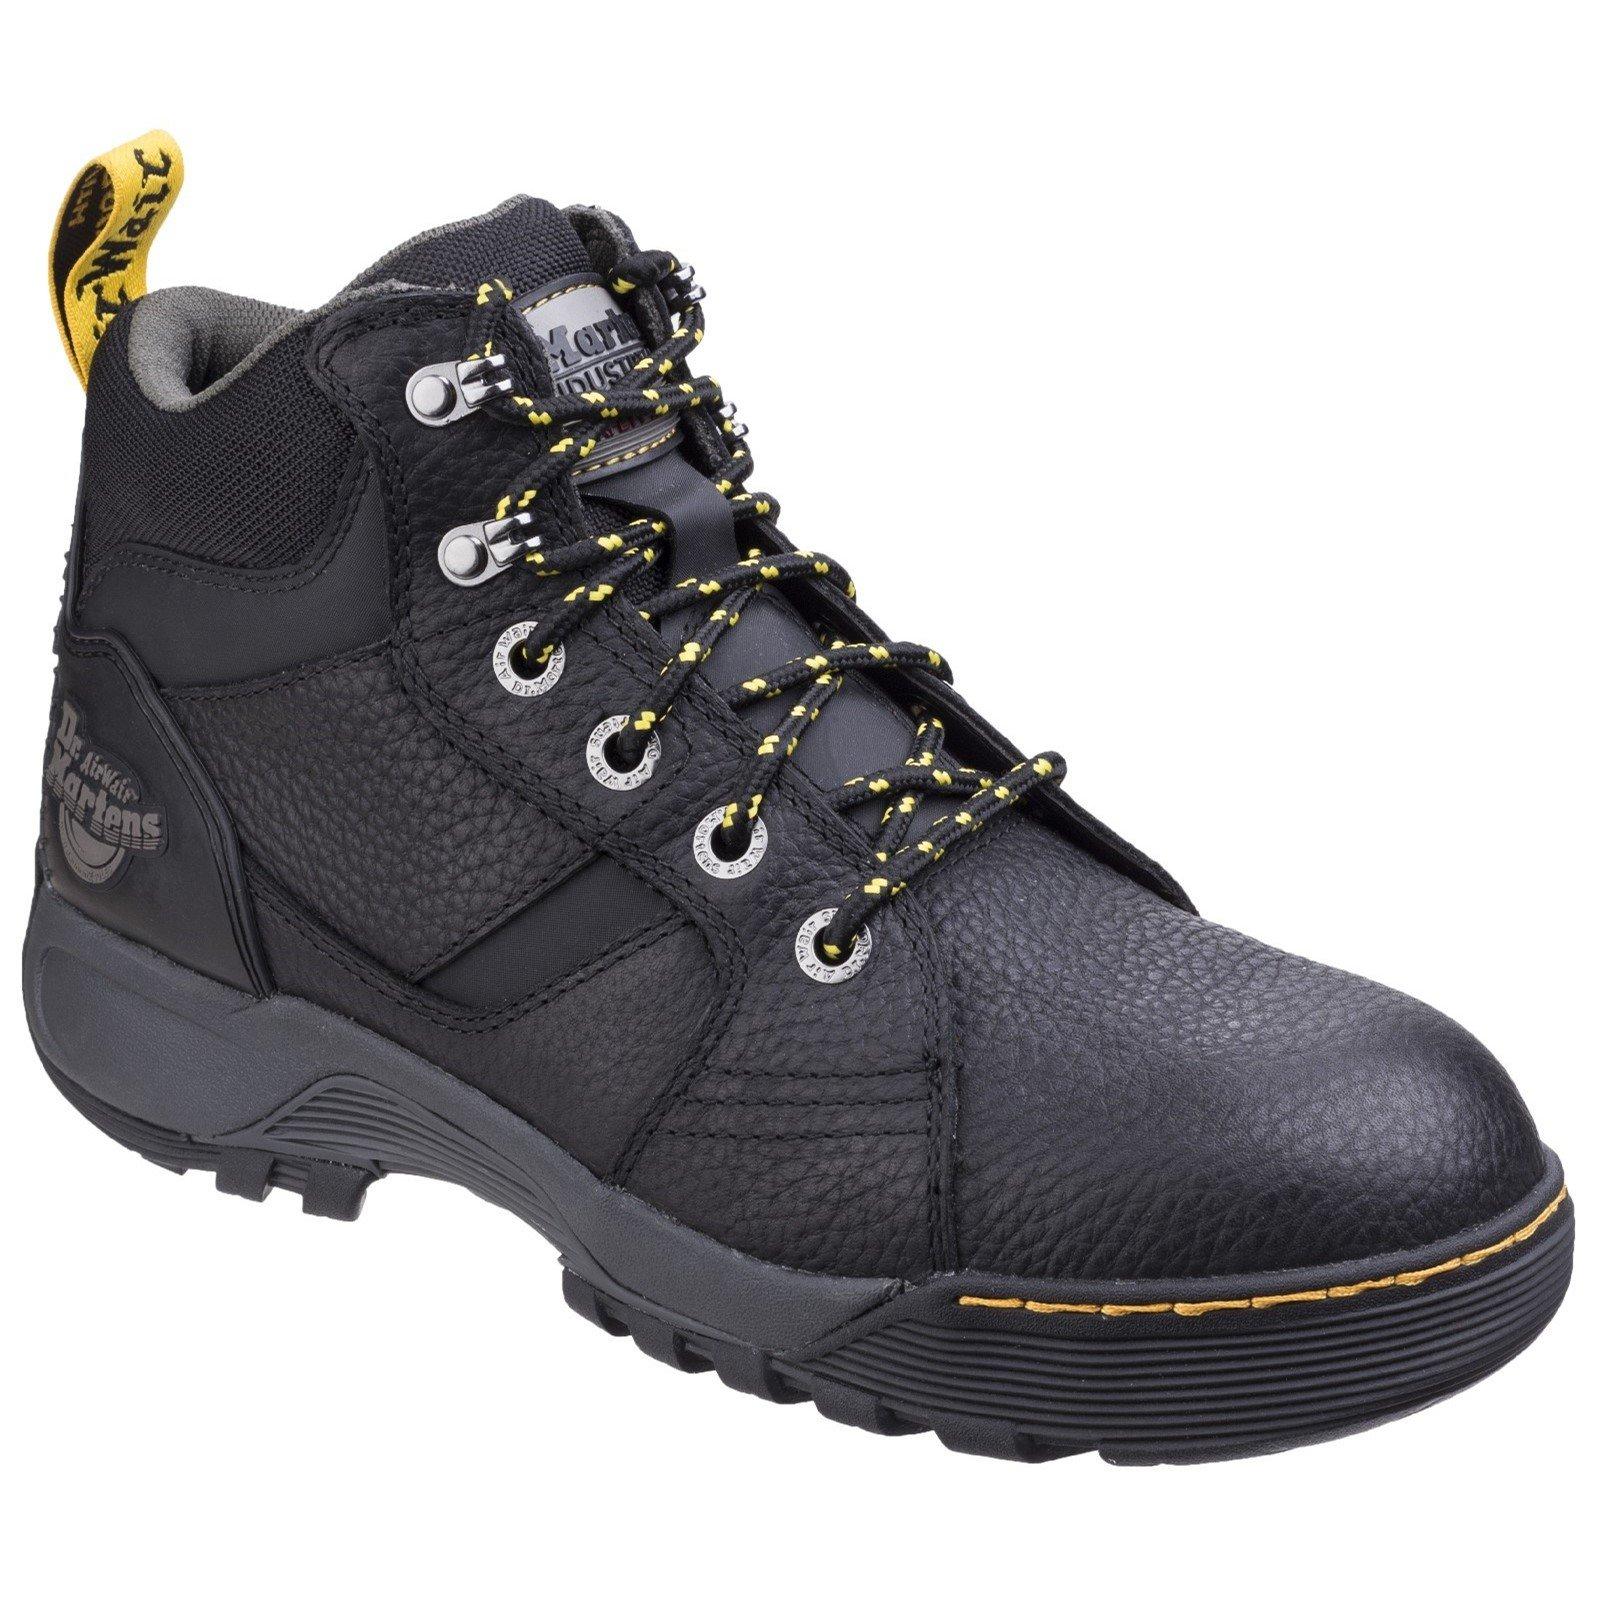 Dr Martens Men's Grapple Safety Boot Various Colours 26023 - Black 12